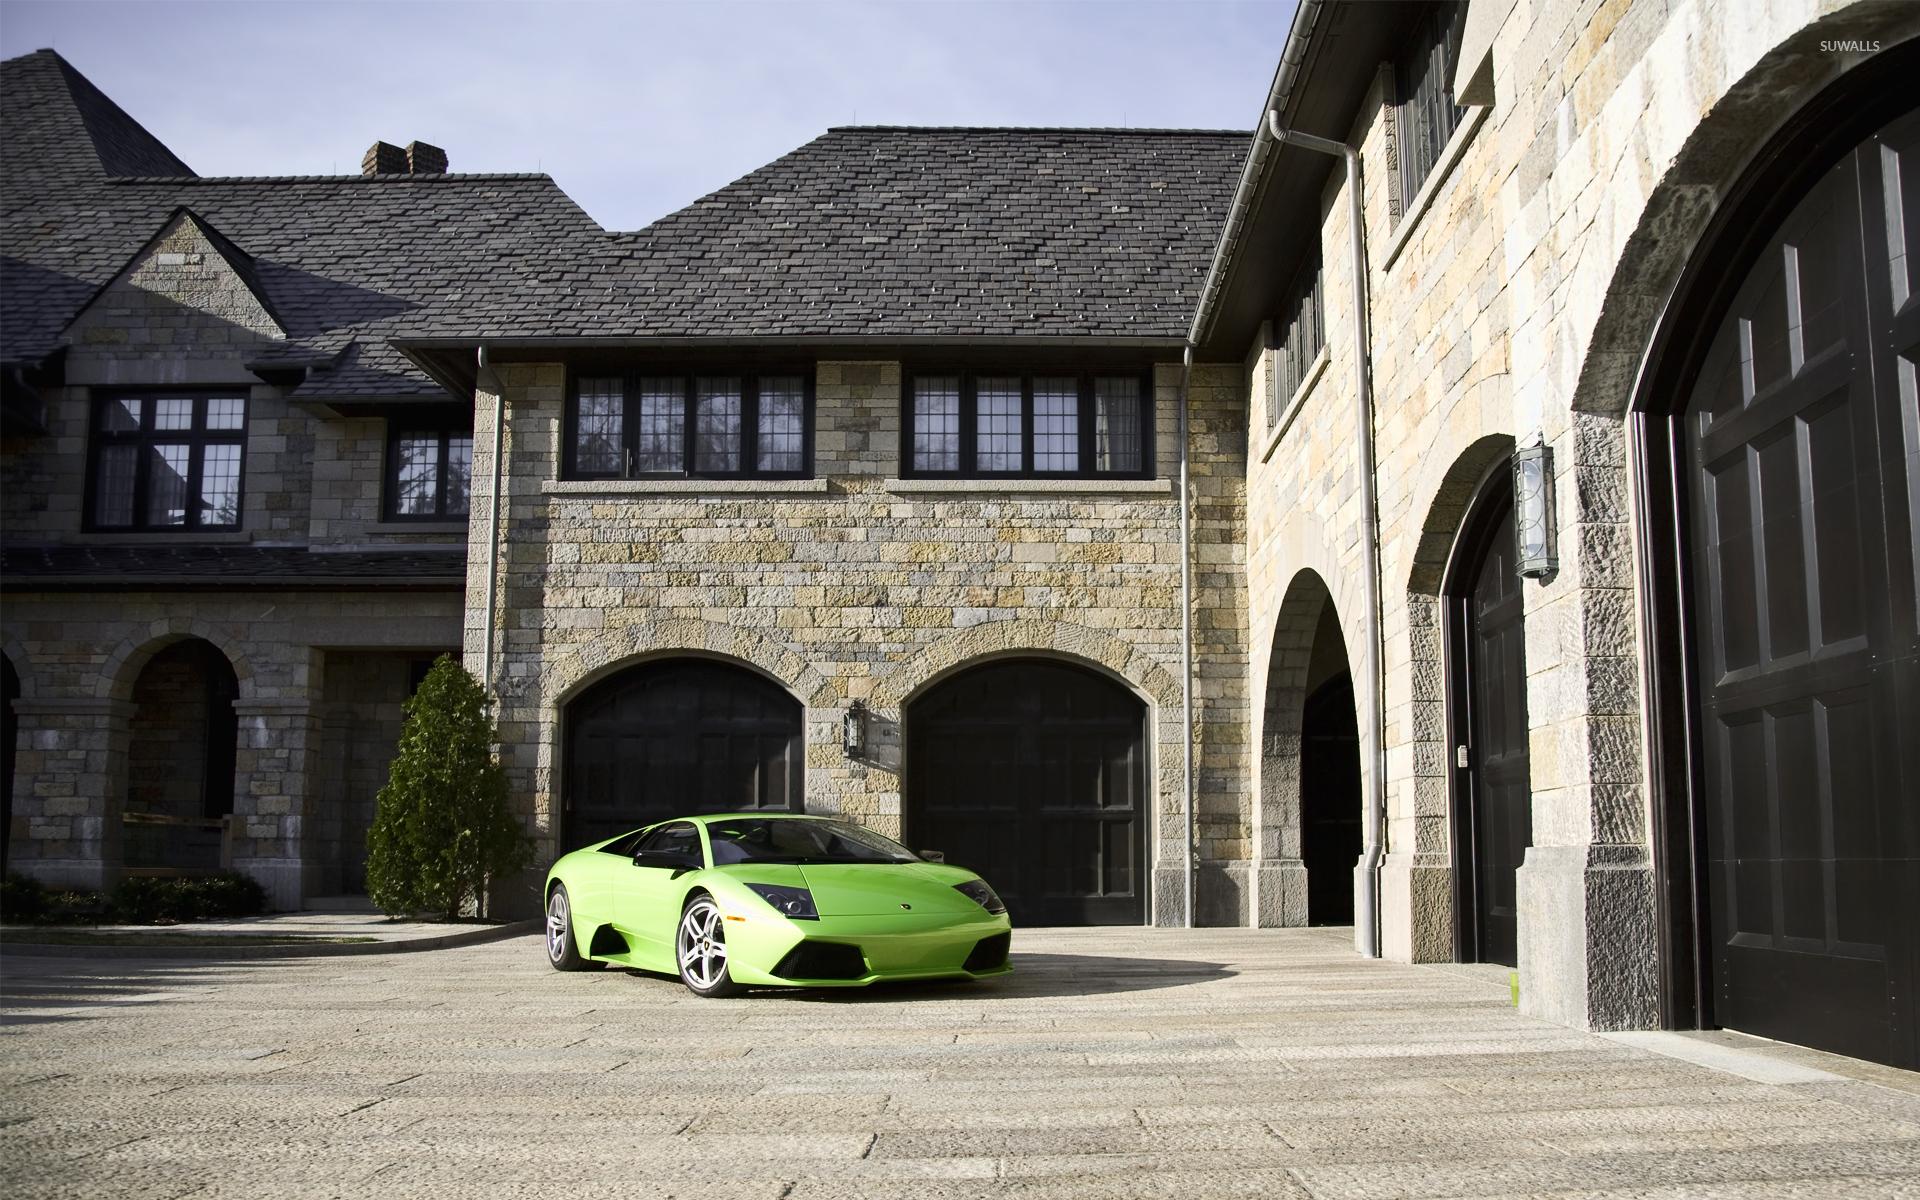 Honda City Car Hd Wallpaper Download Green Lamborghini Murcielago Parked In Front Of A Mansion